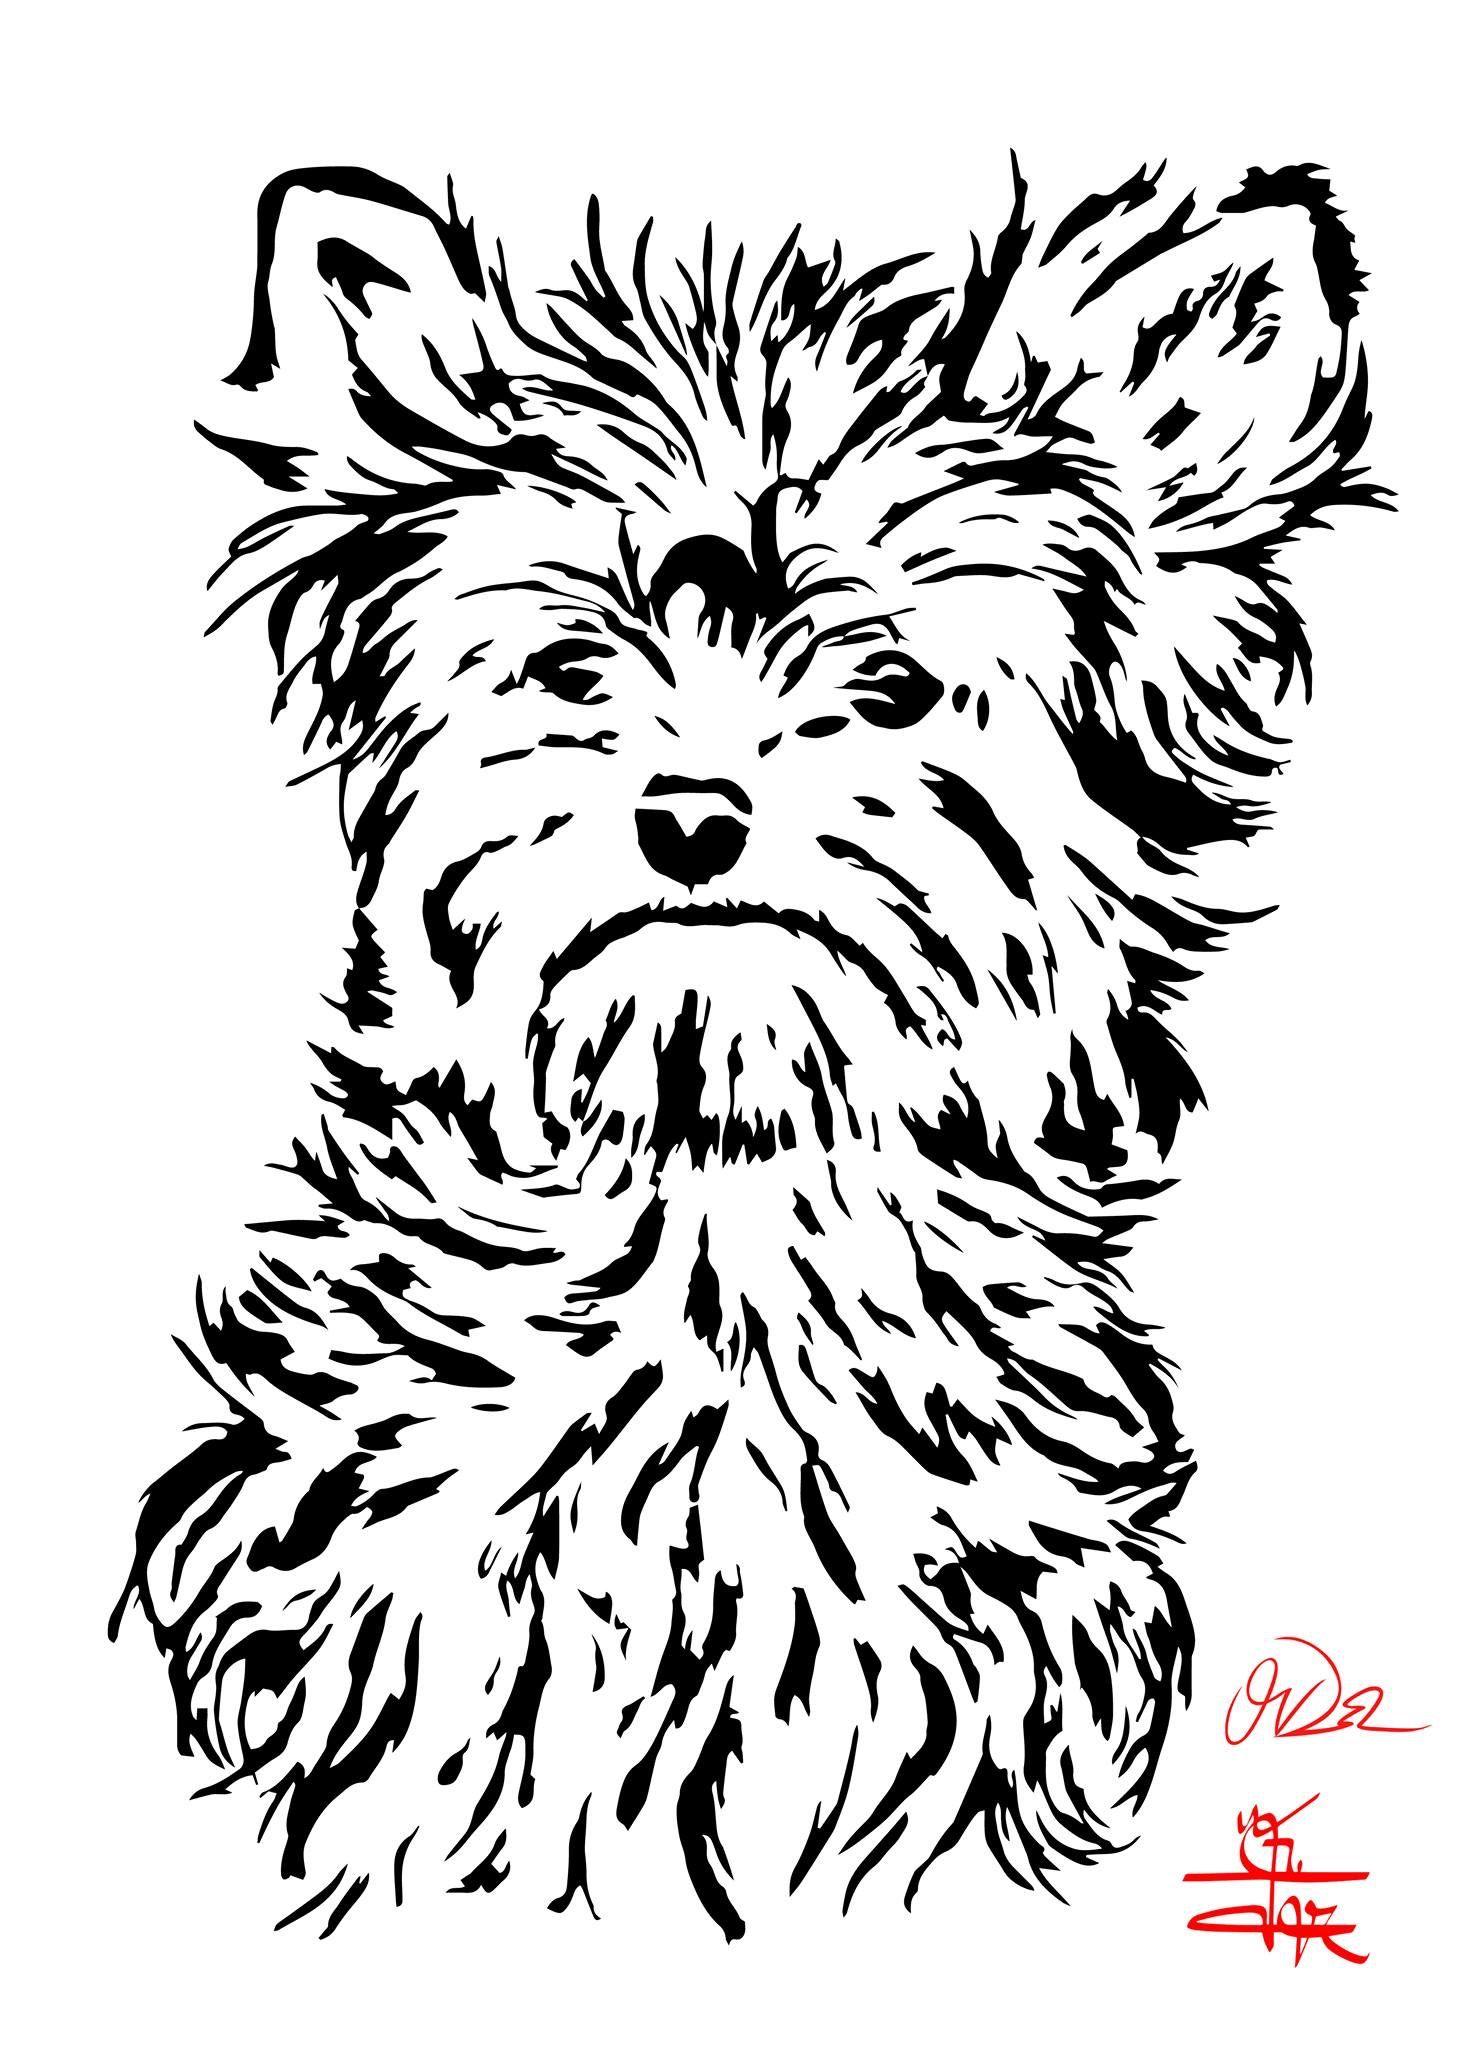 Pin By Natalya Ilina On Vyrezanie Zhivotnye Animal Stencil Dog Stencil Dog Coloring Page